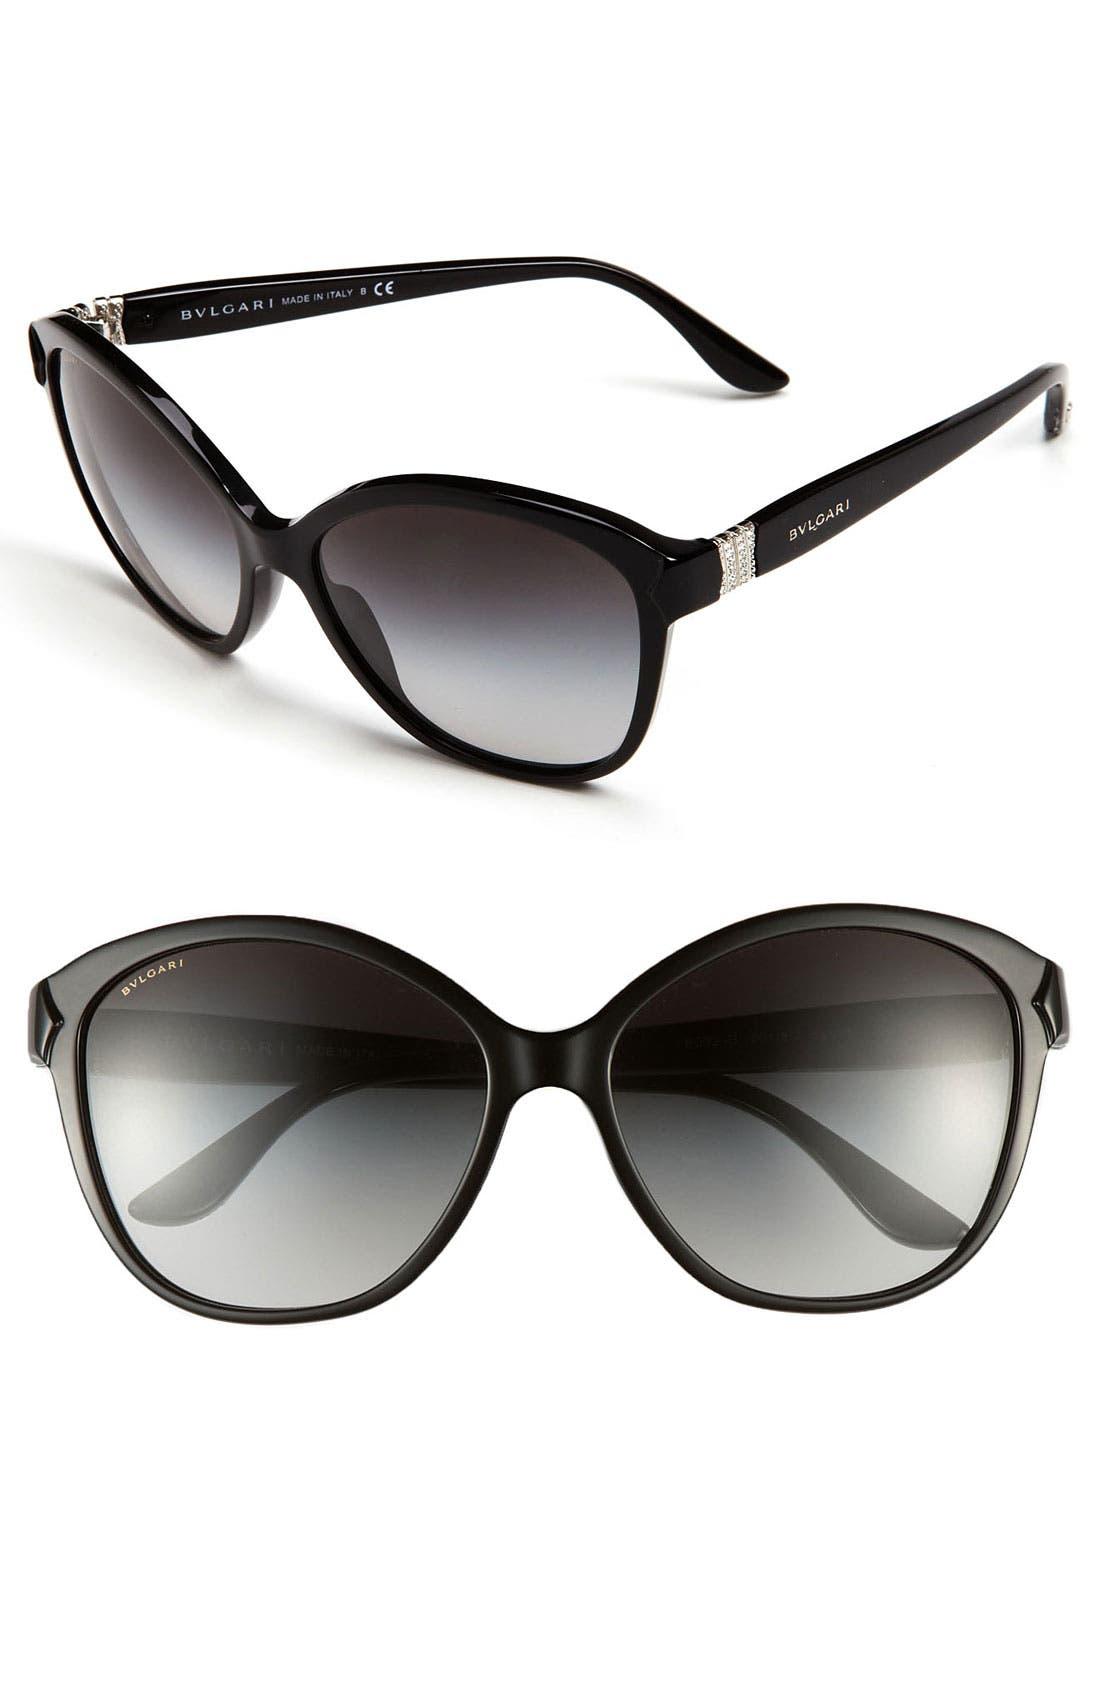 Main Image - Dior 56mm Cat Eye Sunglasses